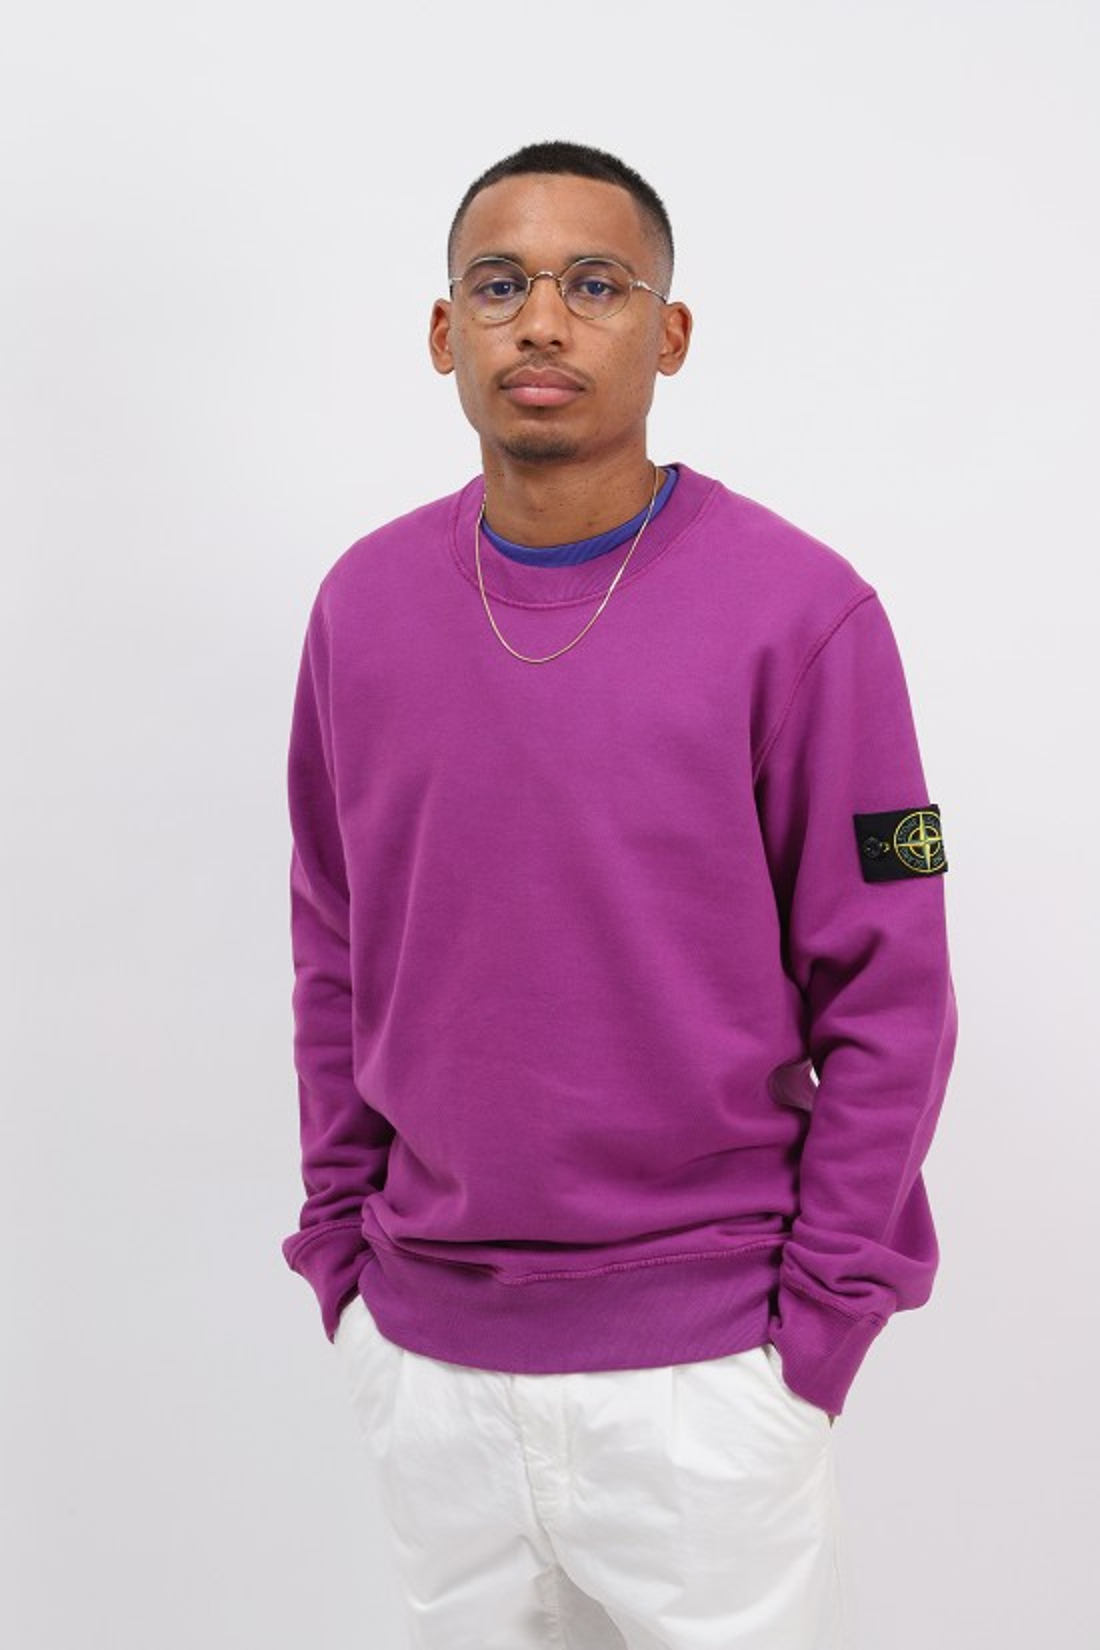 STONE ISLAND / 63020 crewneck sweater v0045 Magenta